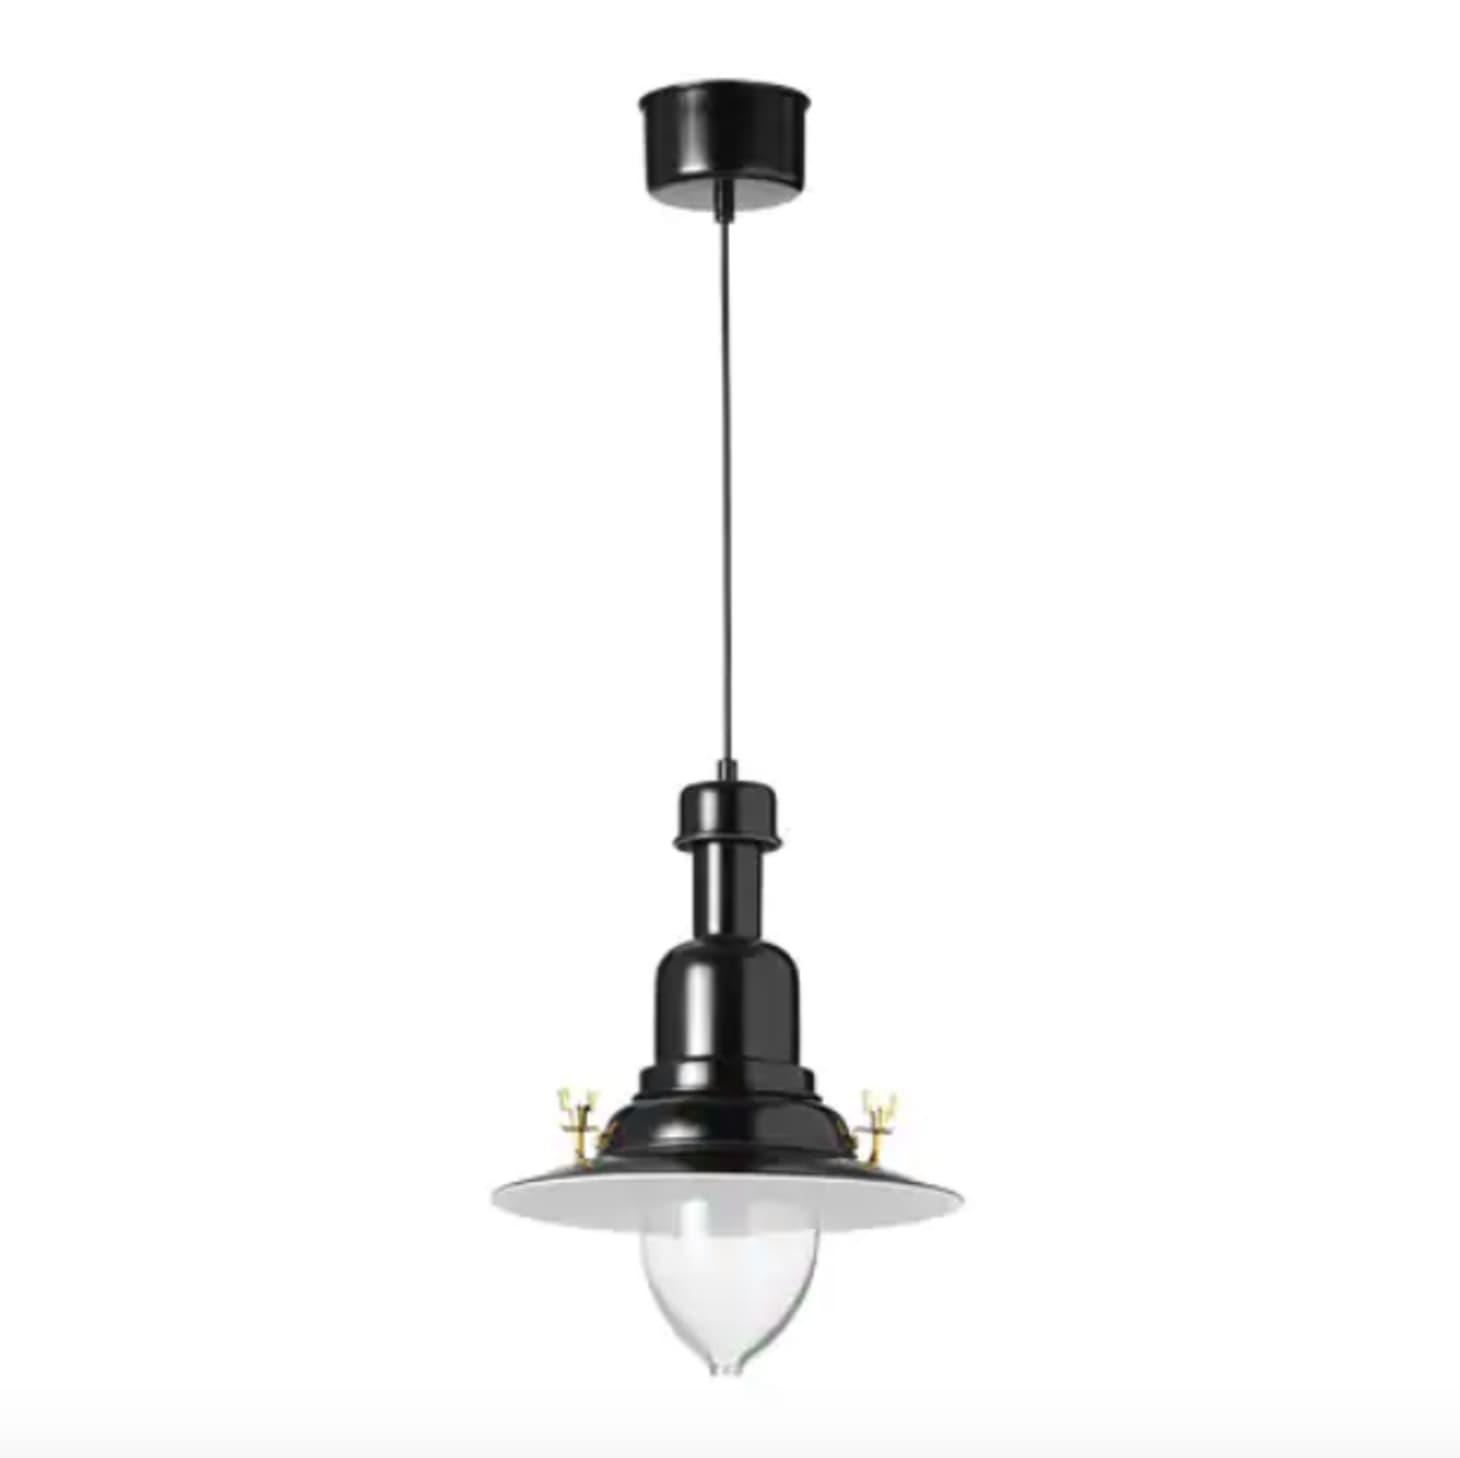 remarkable ikea kitchen catalogue 2020 | IKEA New Catalog - 2020 | Kitchn